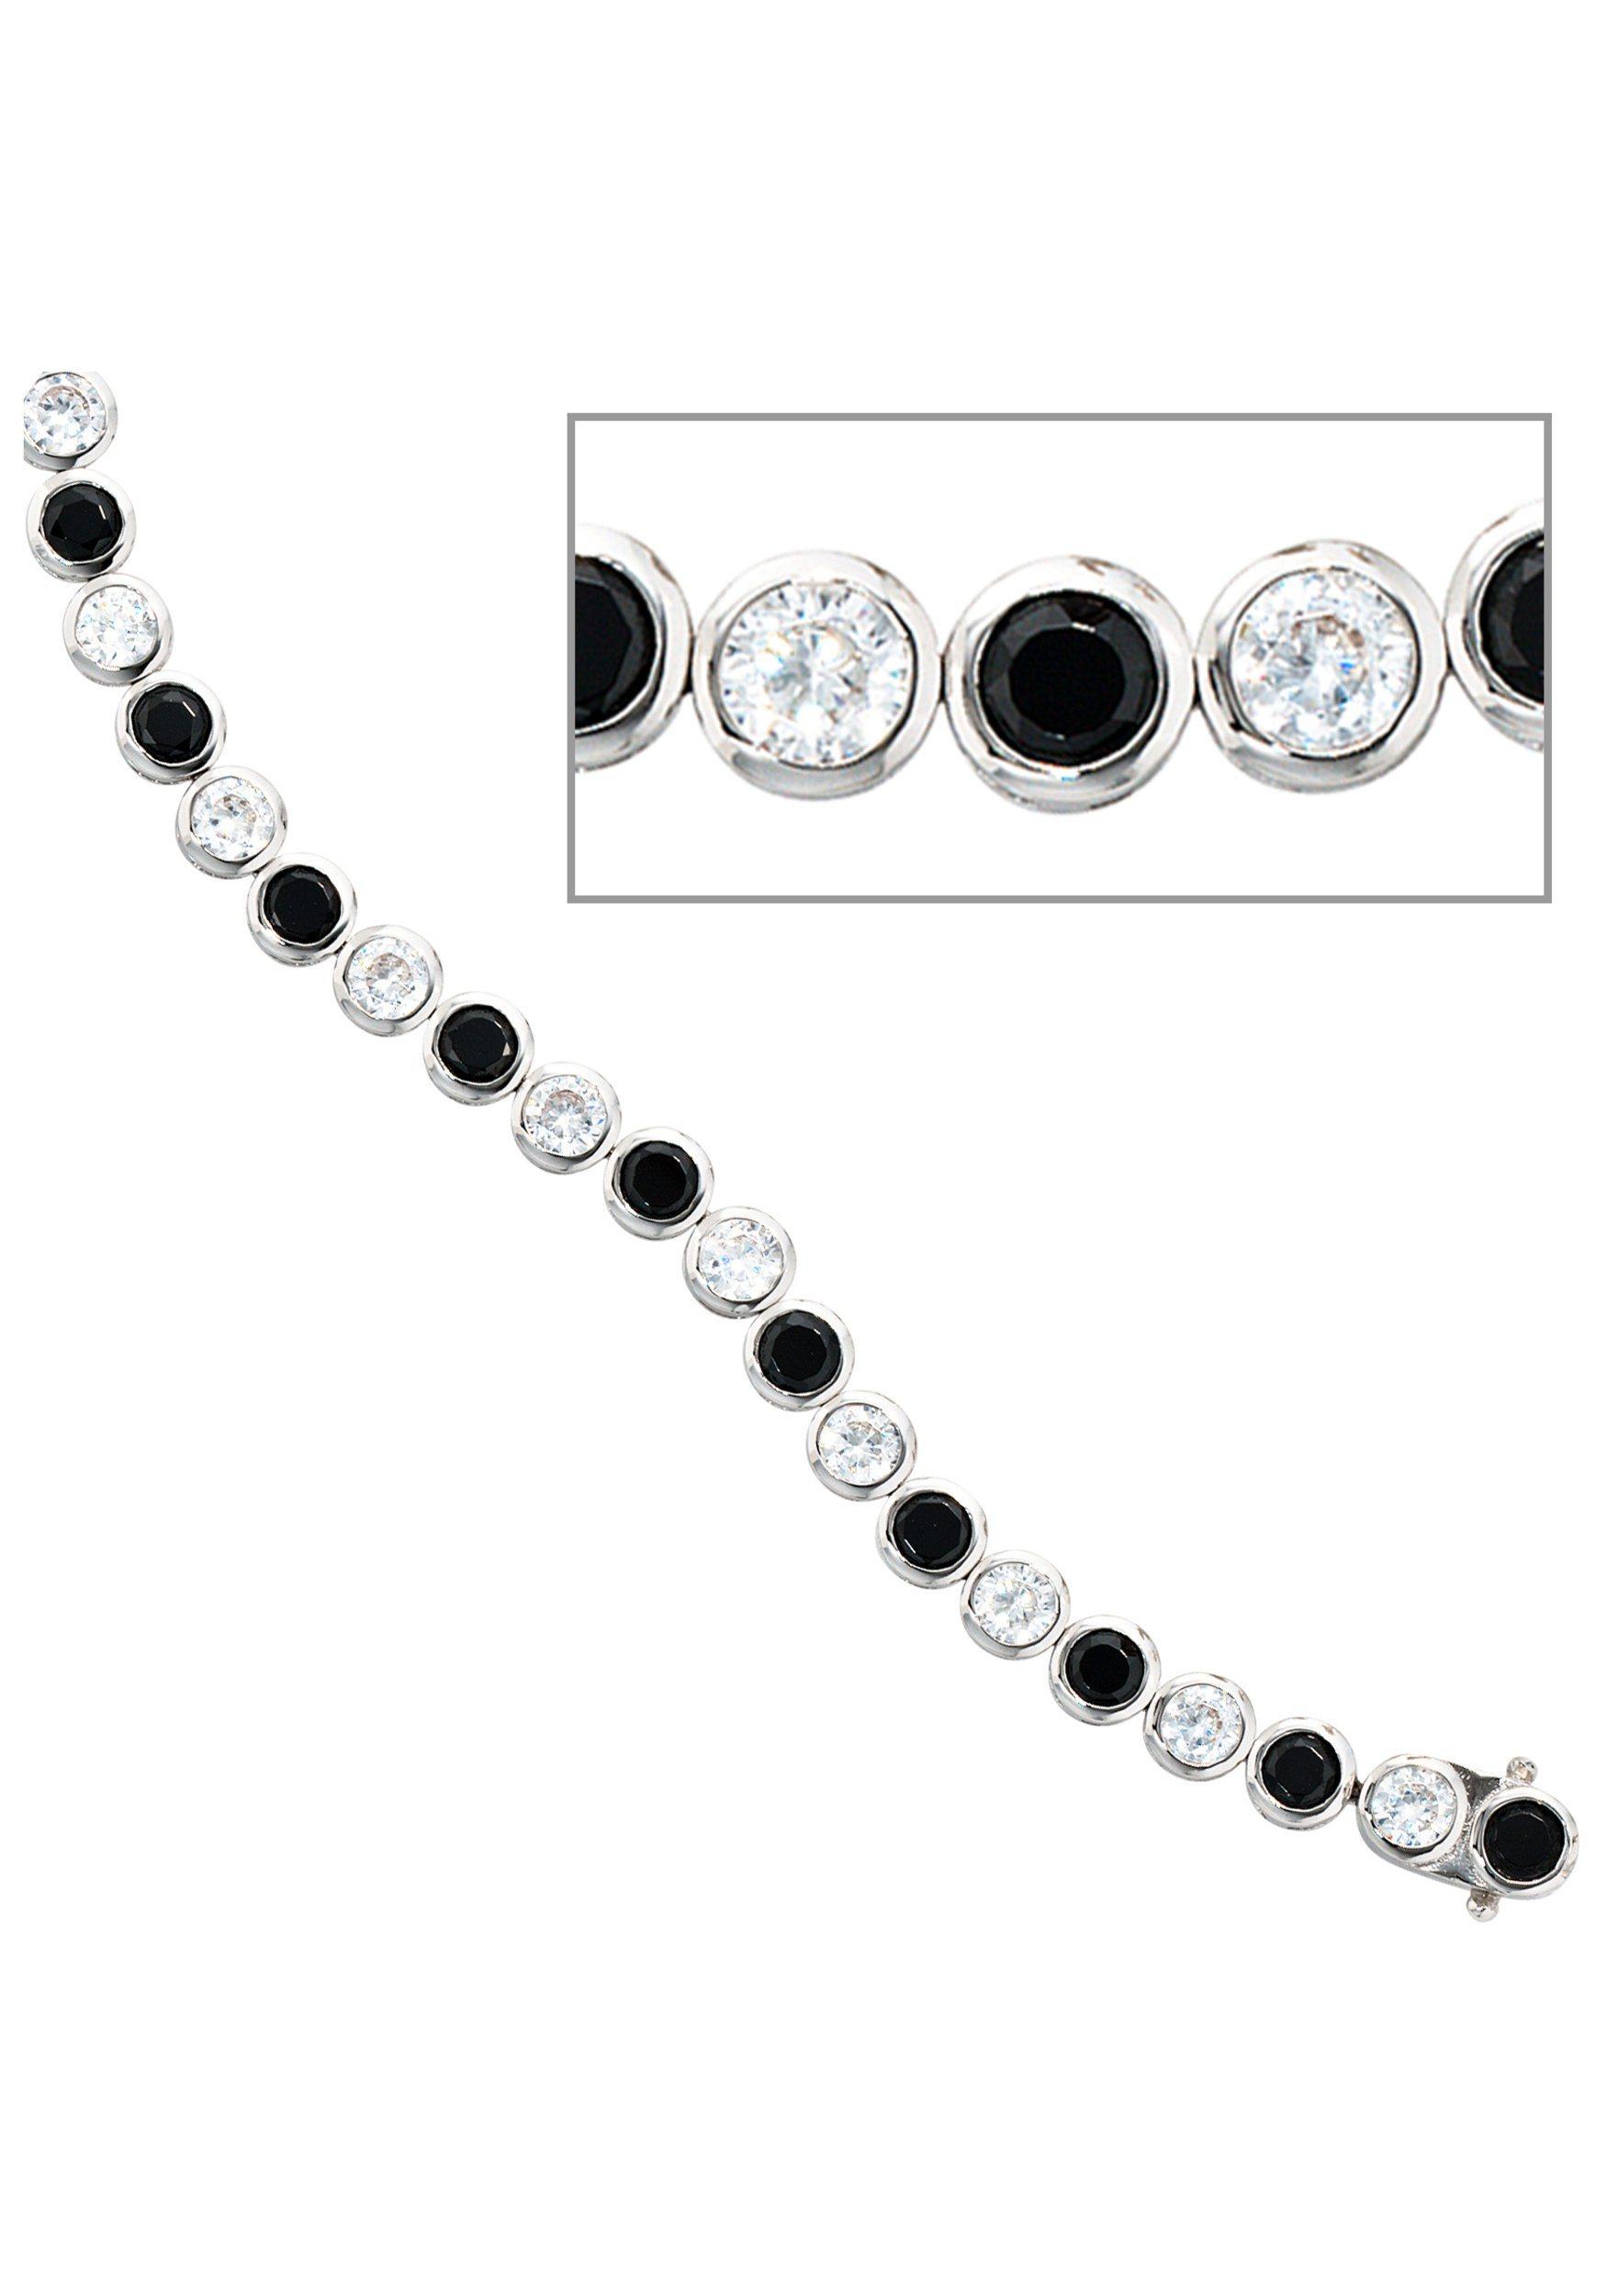 JOBO Silberarmband, 925 Silber mit Zirkonia 19 cm   Schmuck > Armbänder > Silberarmbänder   Silber   JOBO